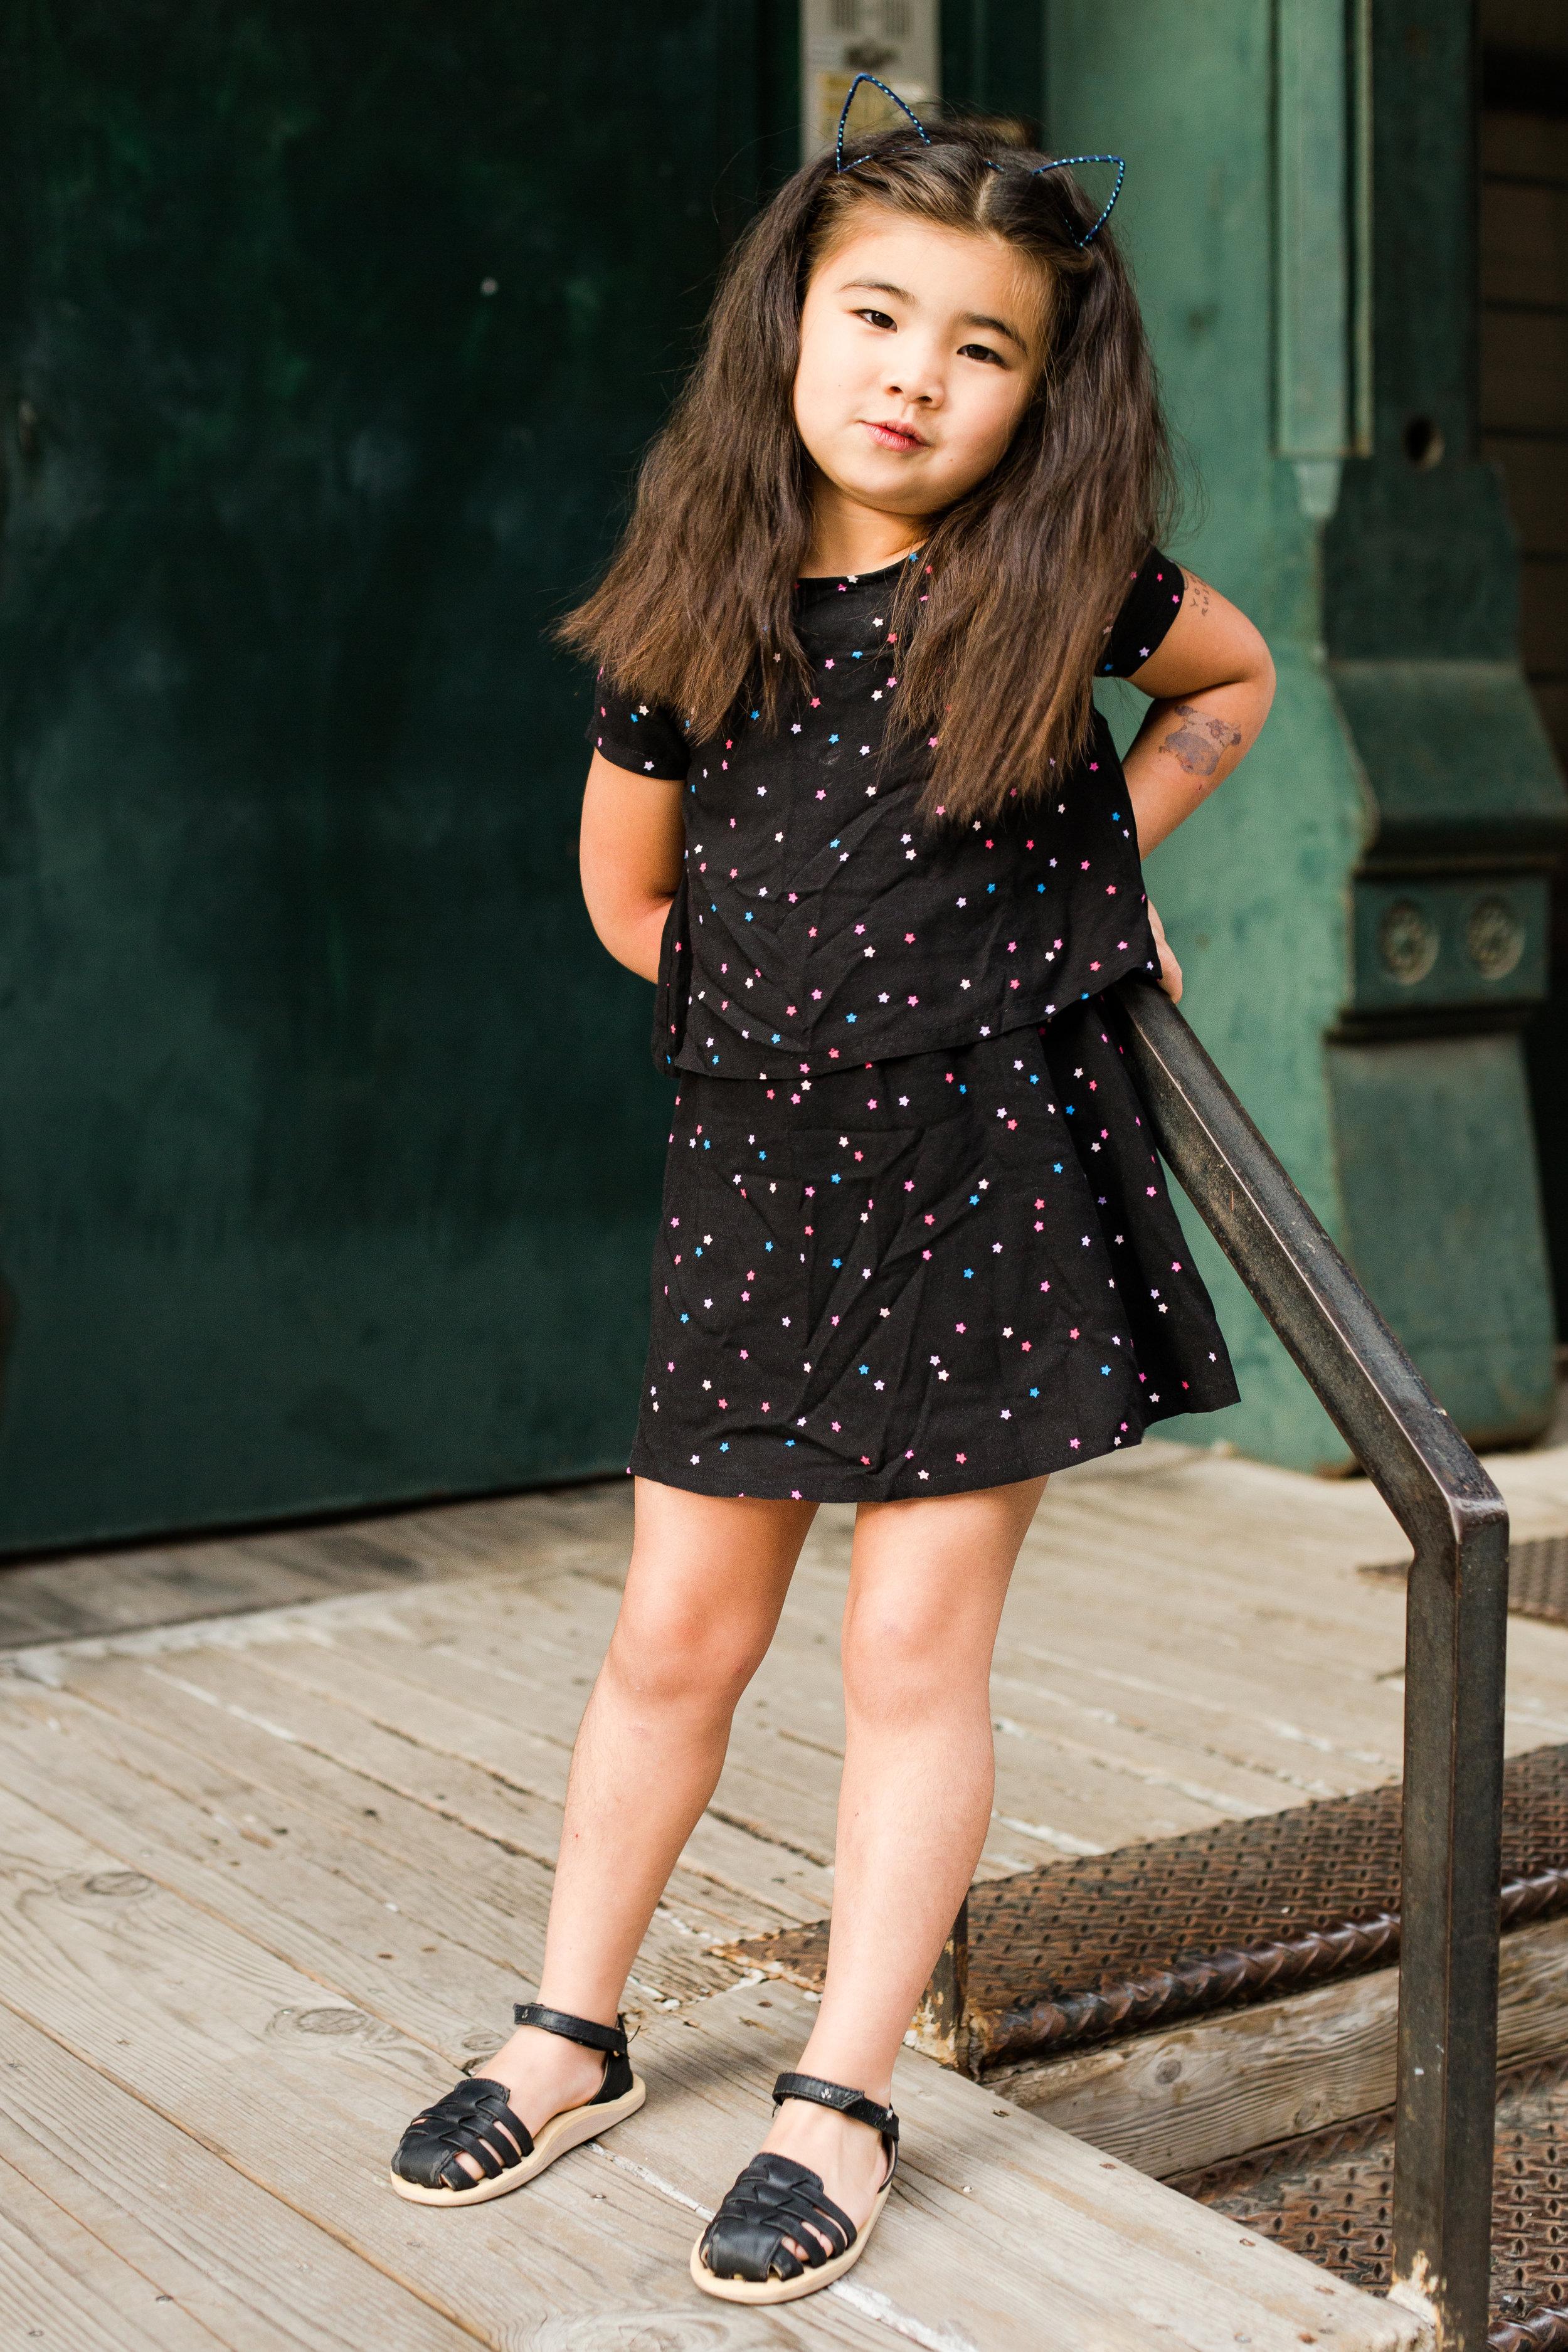 lissiephoto_loomis_nyc_family_photography3.JPG